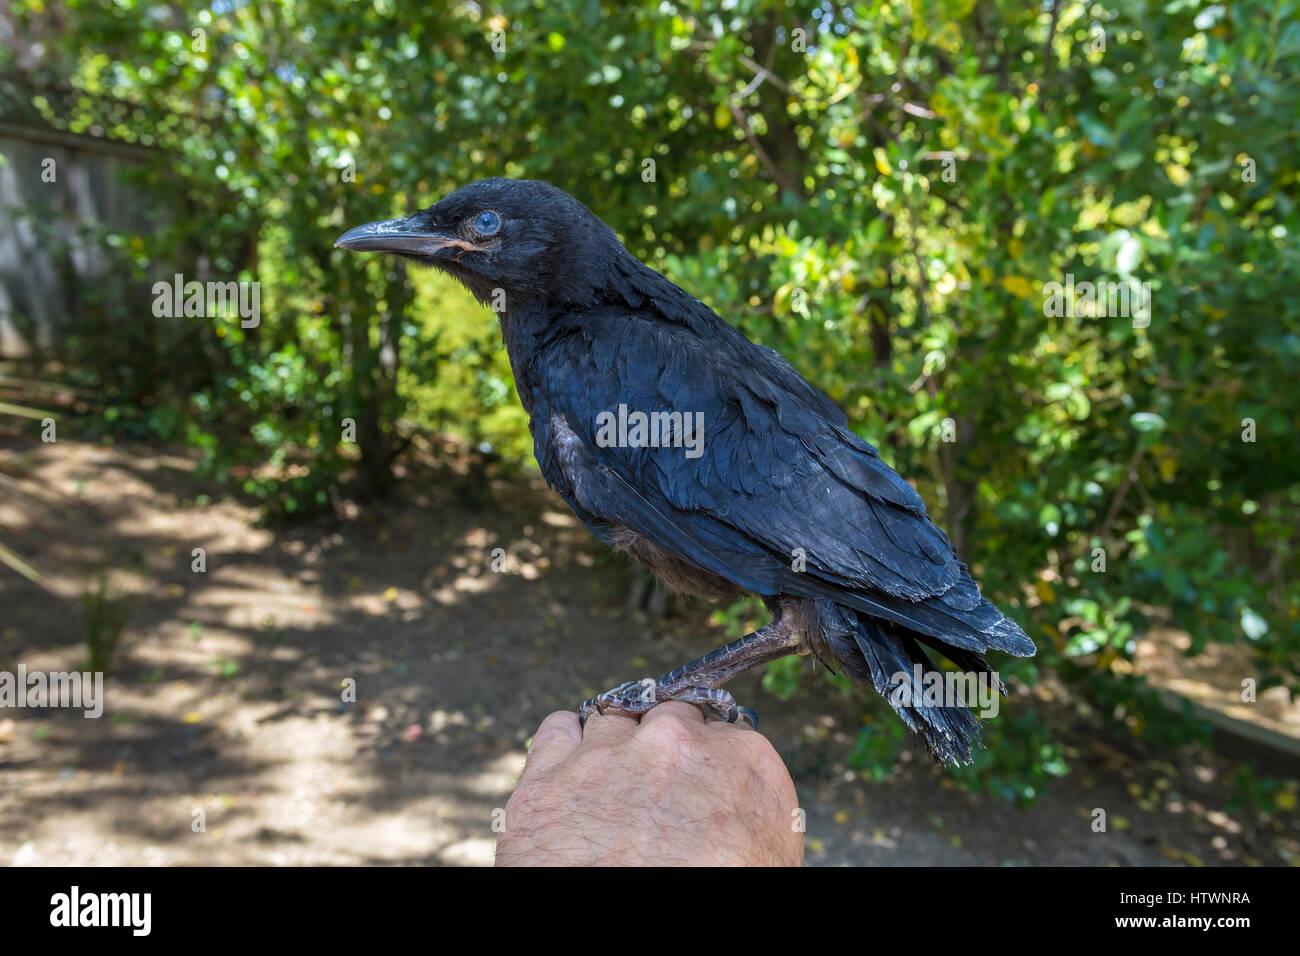 American crow, fledgling crow, juvenile crow, injured bird ...